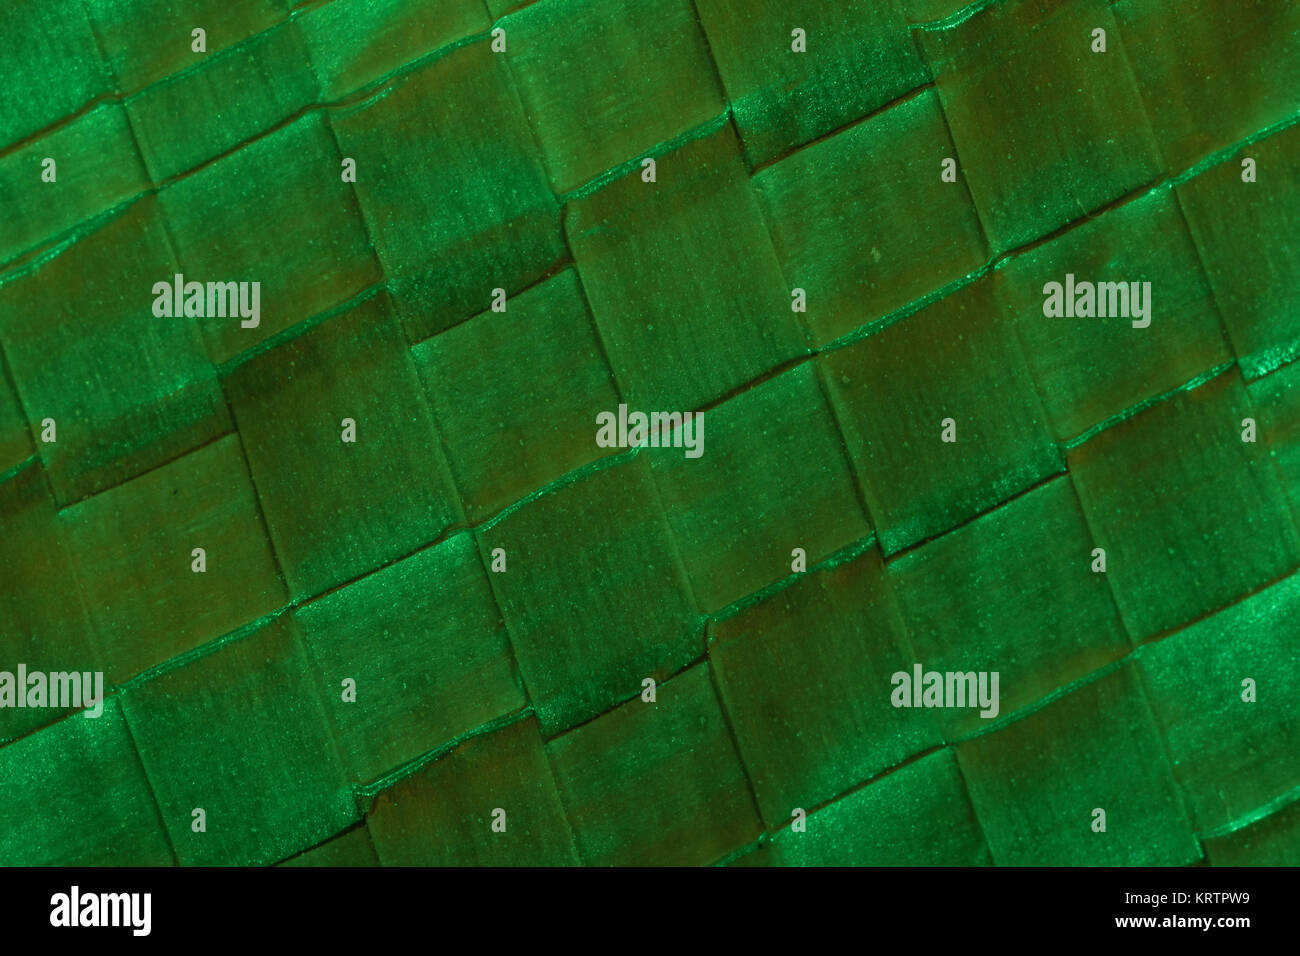 Macro-photo of woven polypropylene ground-sheet. - Stock Image